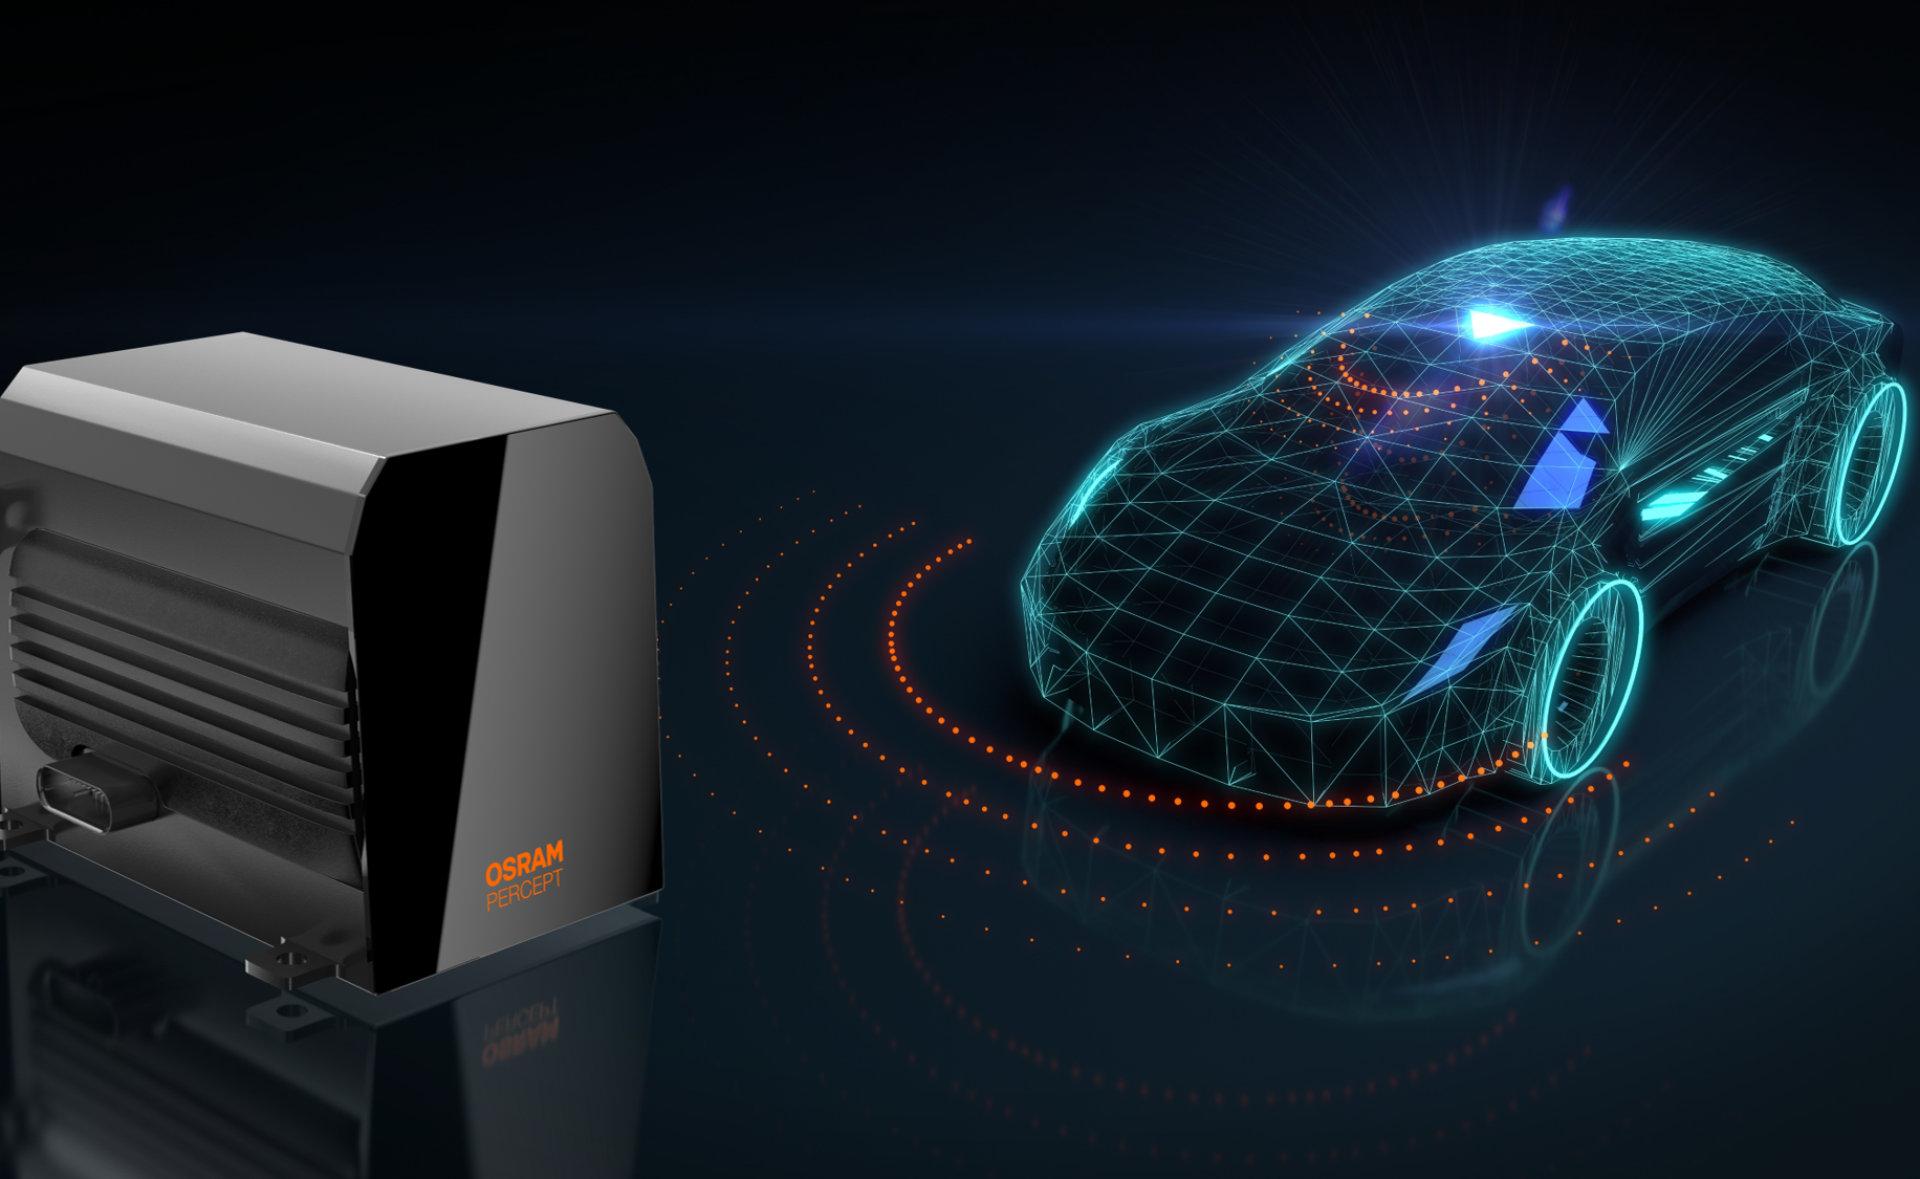 OSRAM LiDAR percept platform